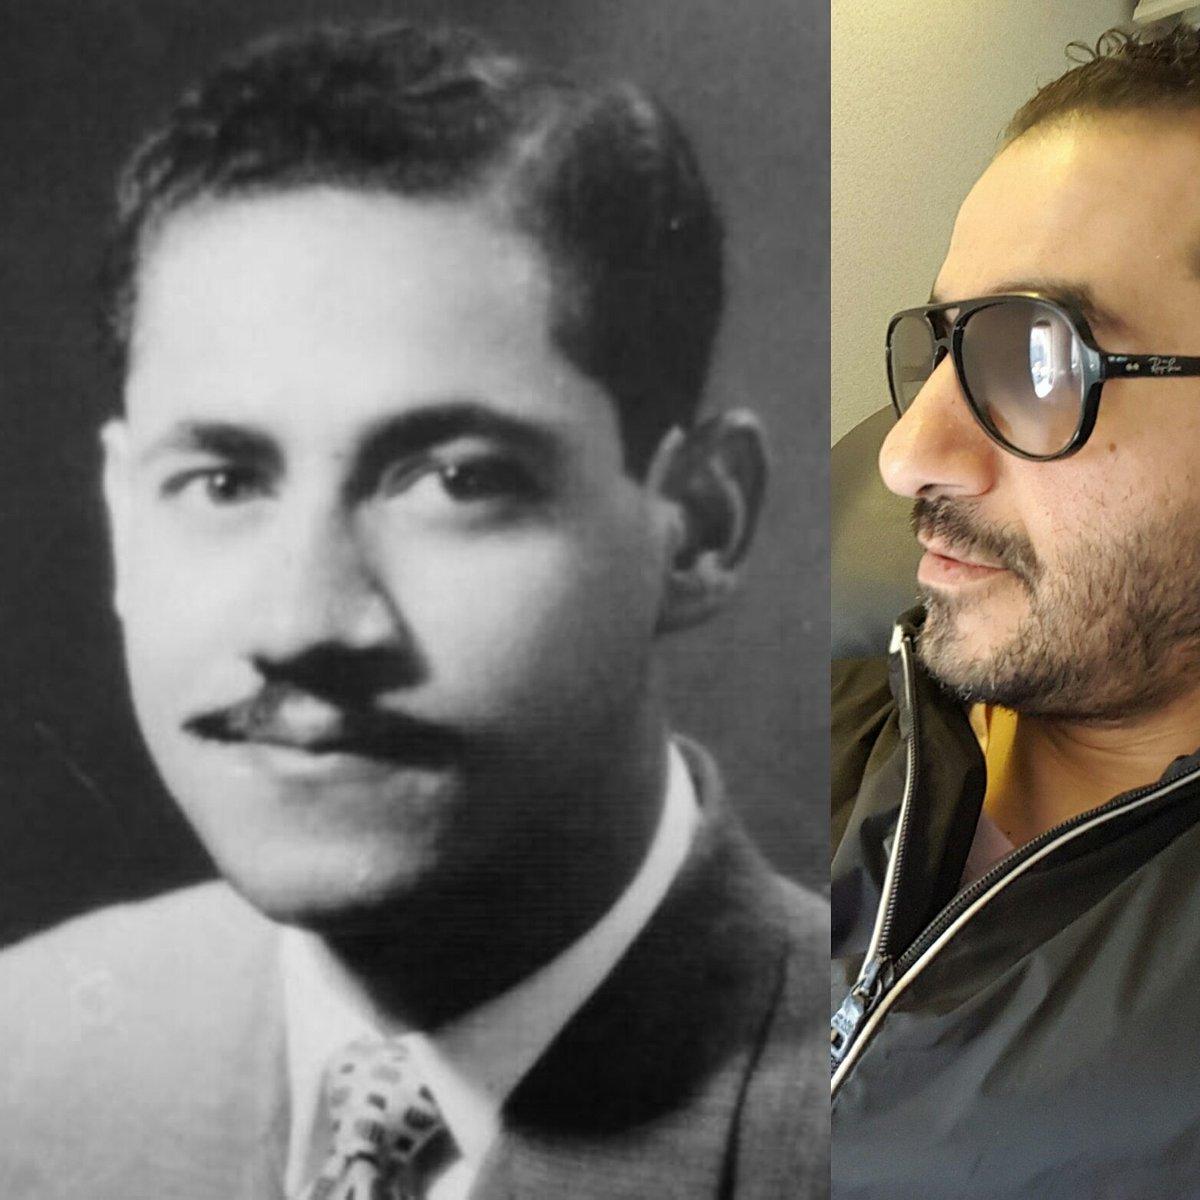 احمد حلمي ووالده